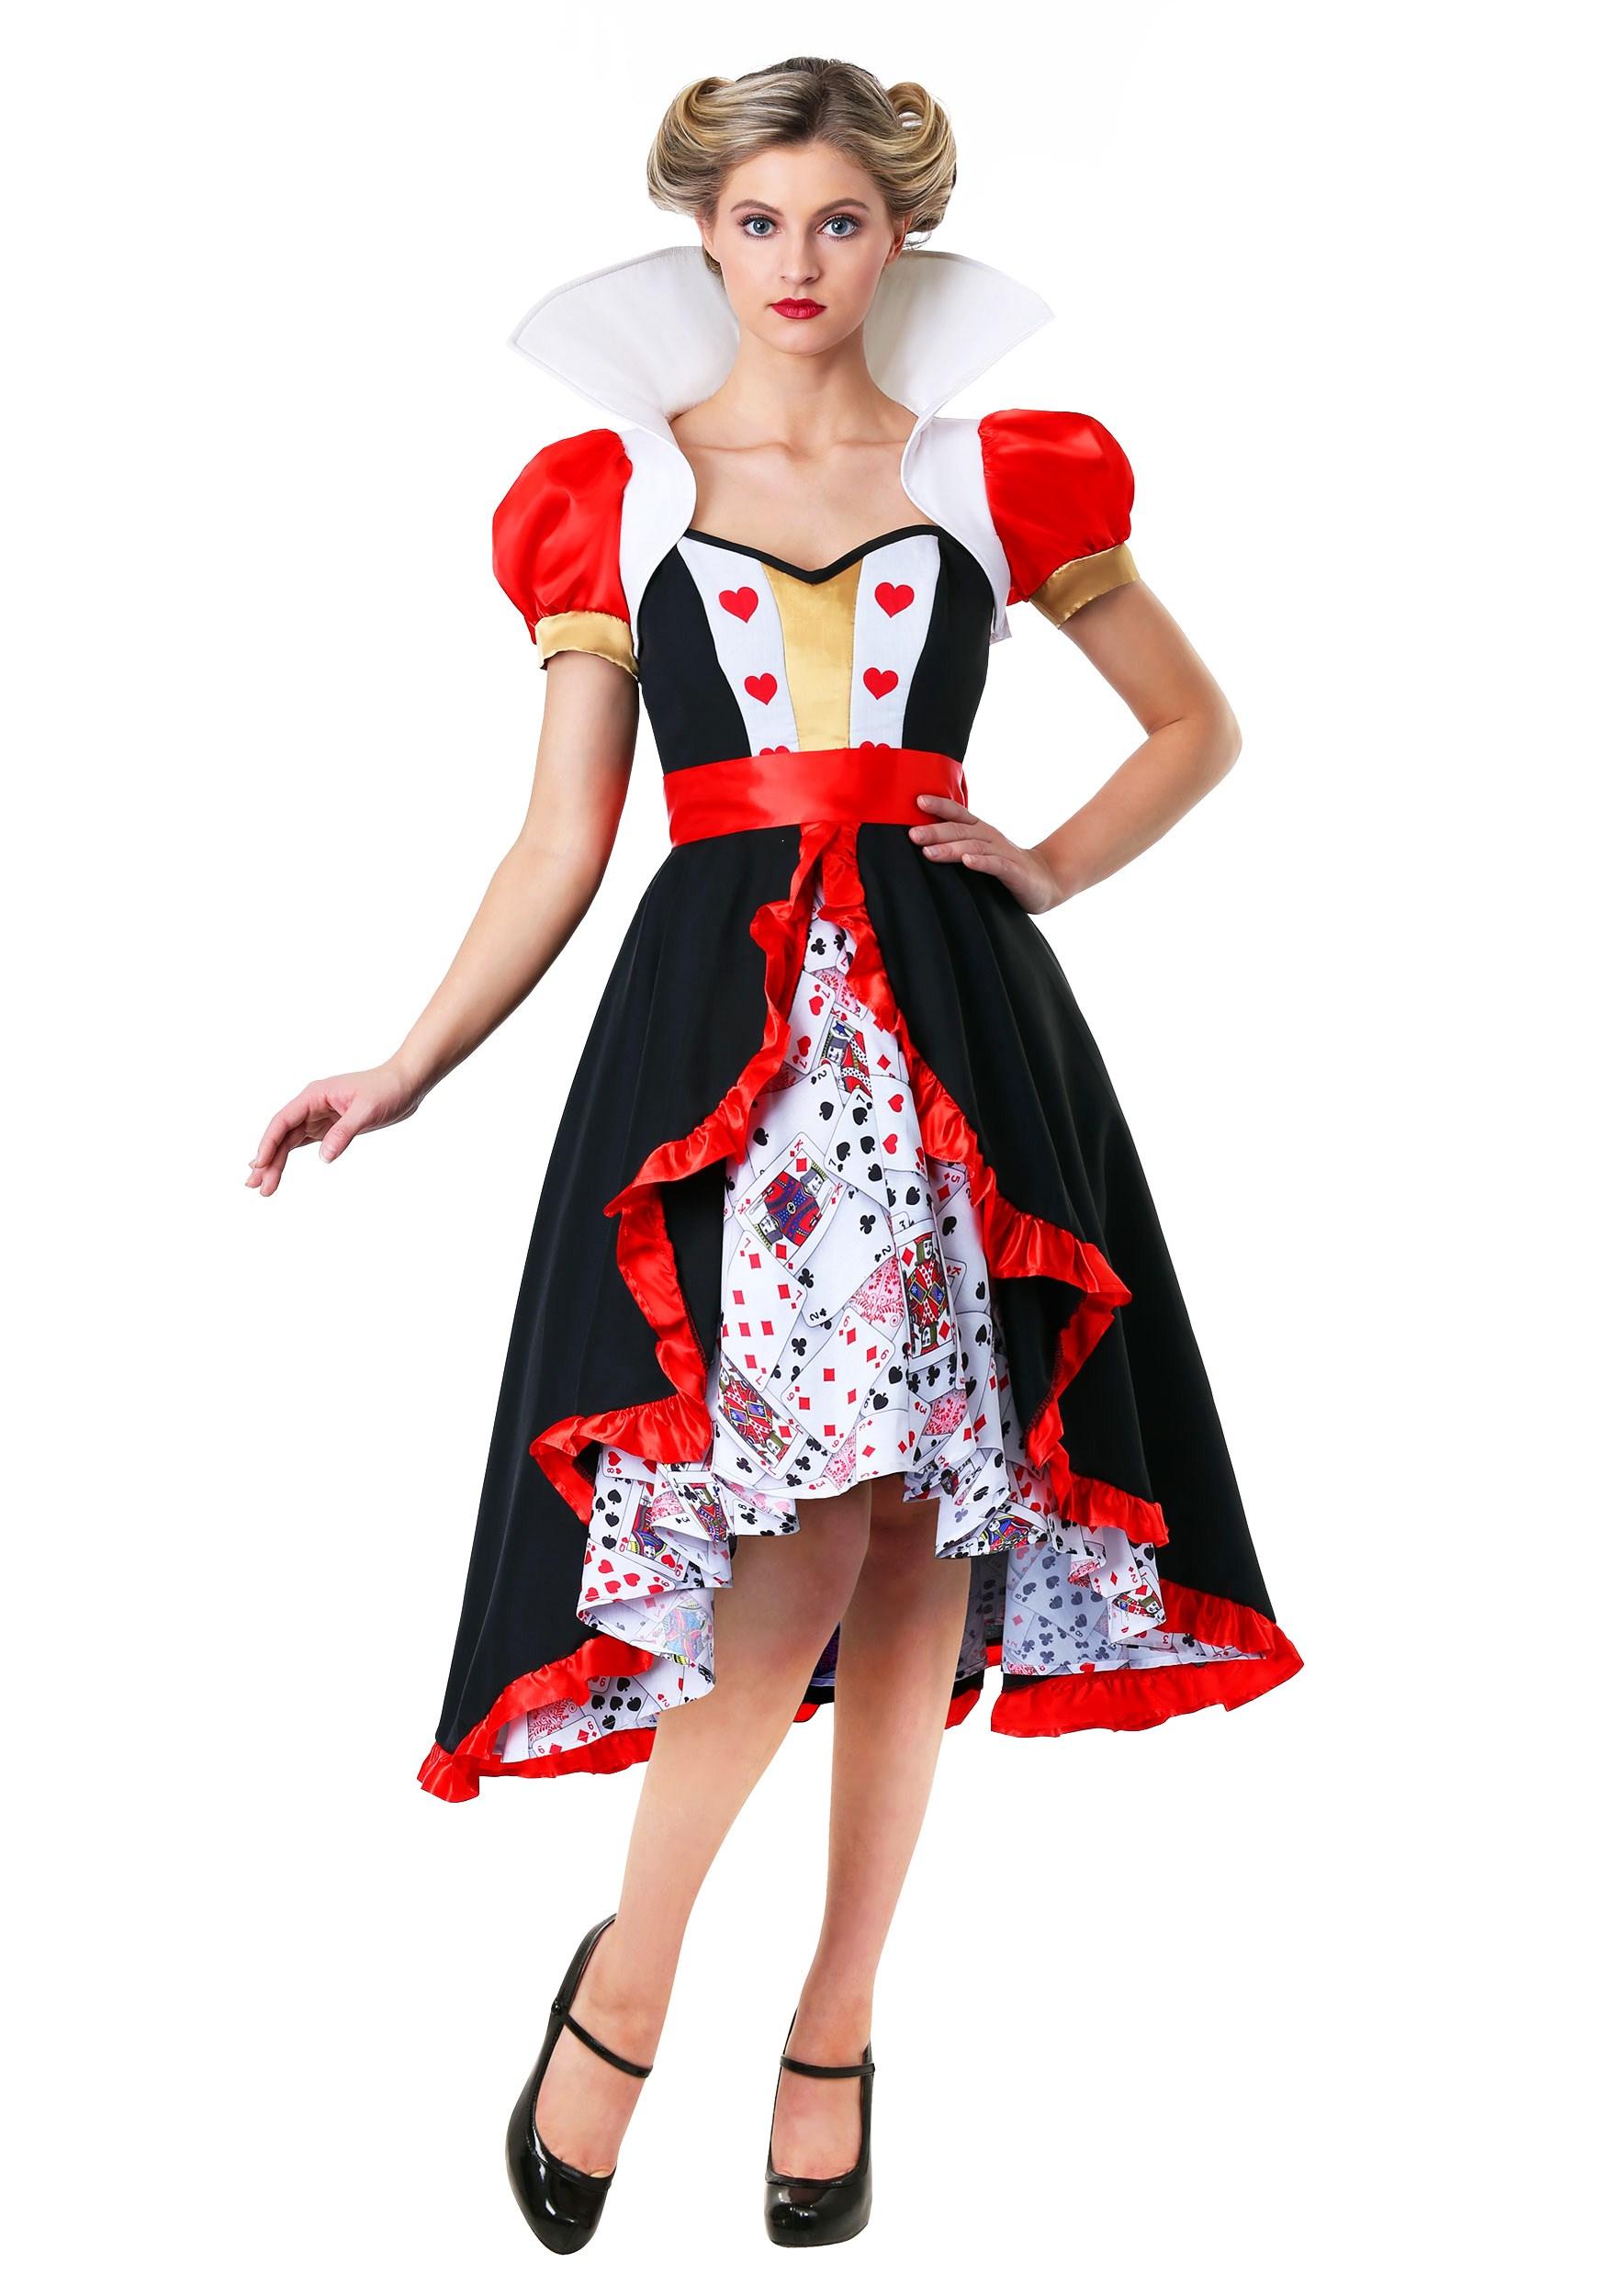 Flirty Queen of Hearts Costume for Women